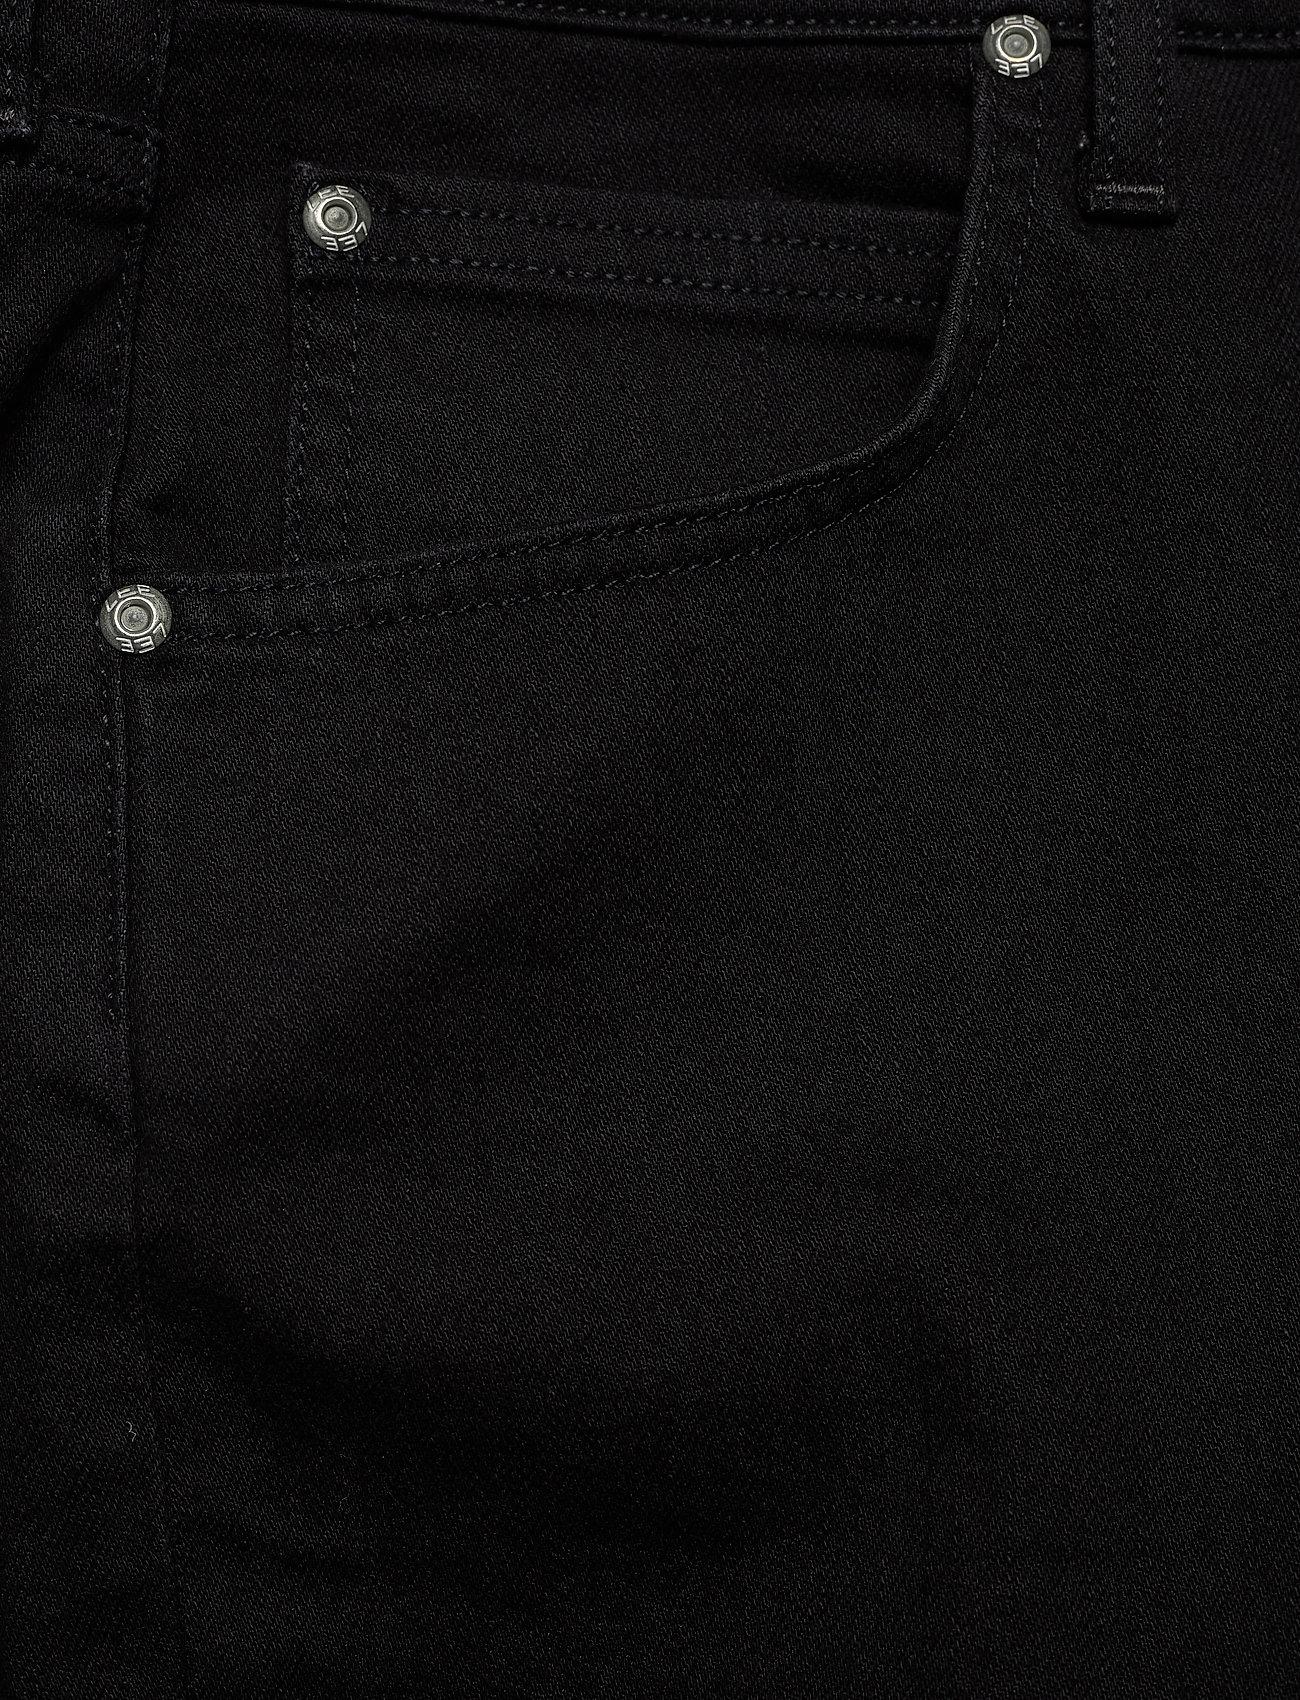 Lee Jeans - AUSTIN - regular jeans - clean black - 1